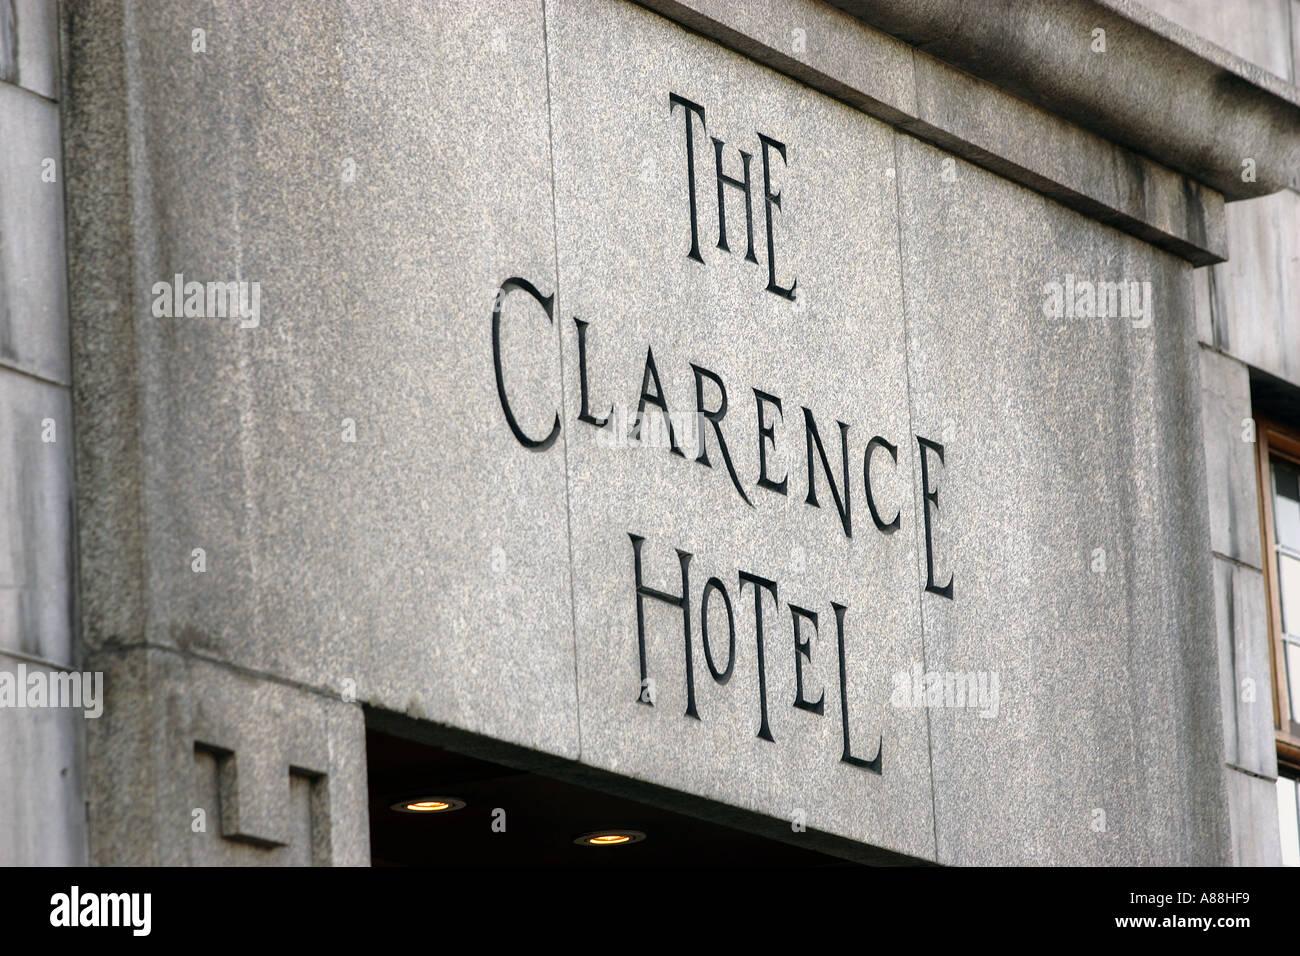 Clarence Hotel Dublin Stock Photos Amp Clarence Hotel Dublin